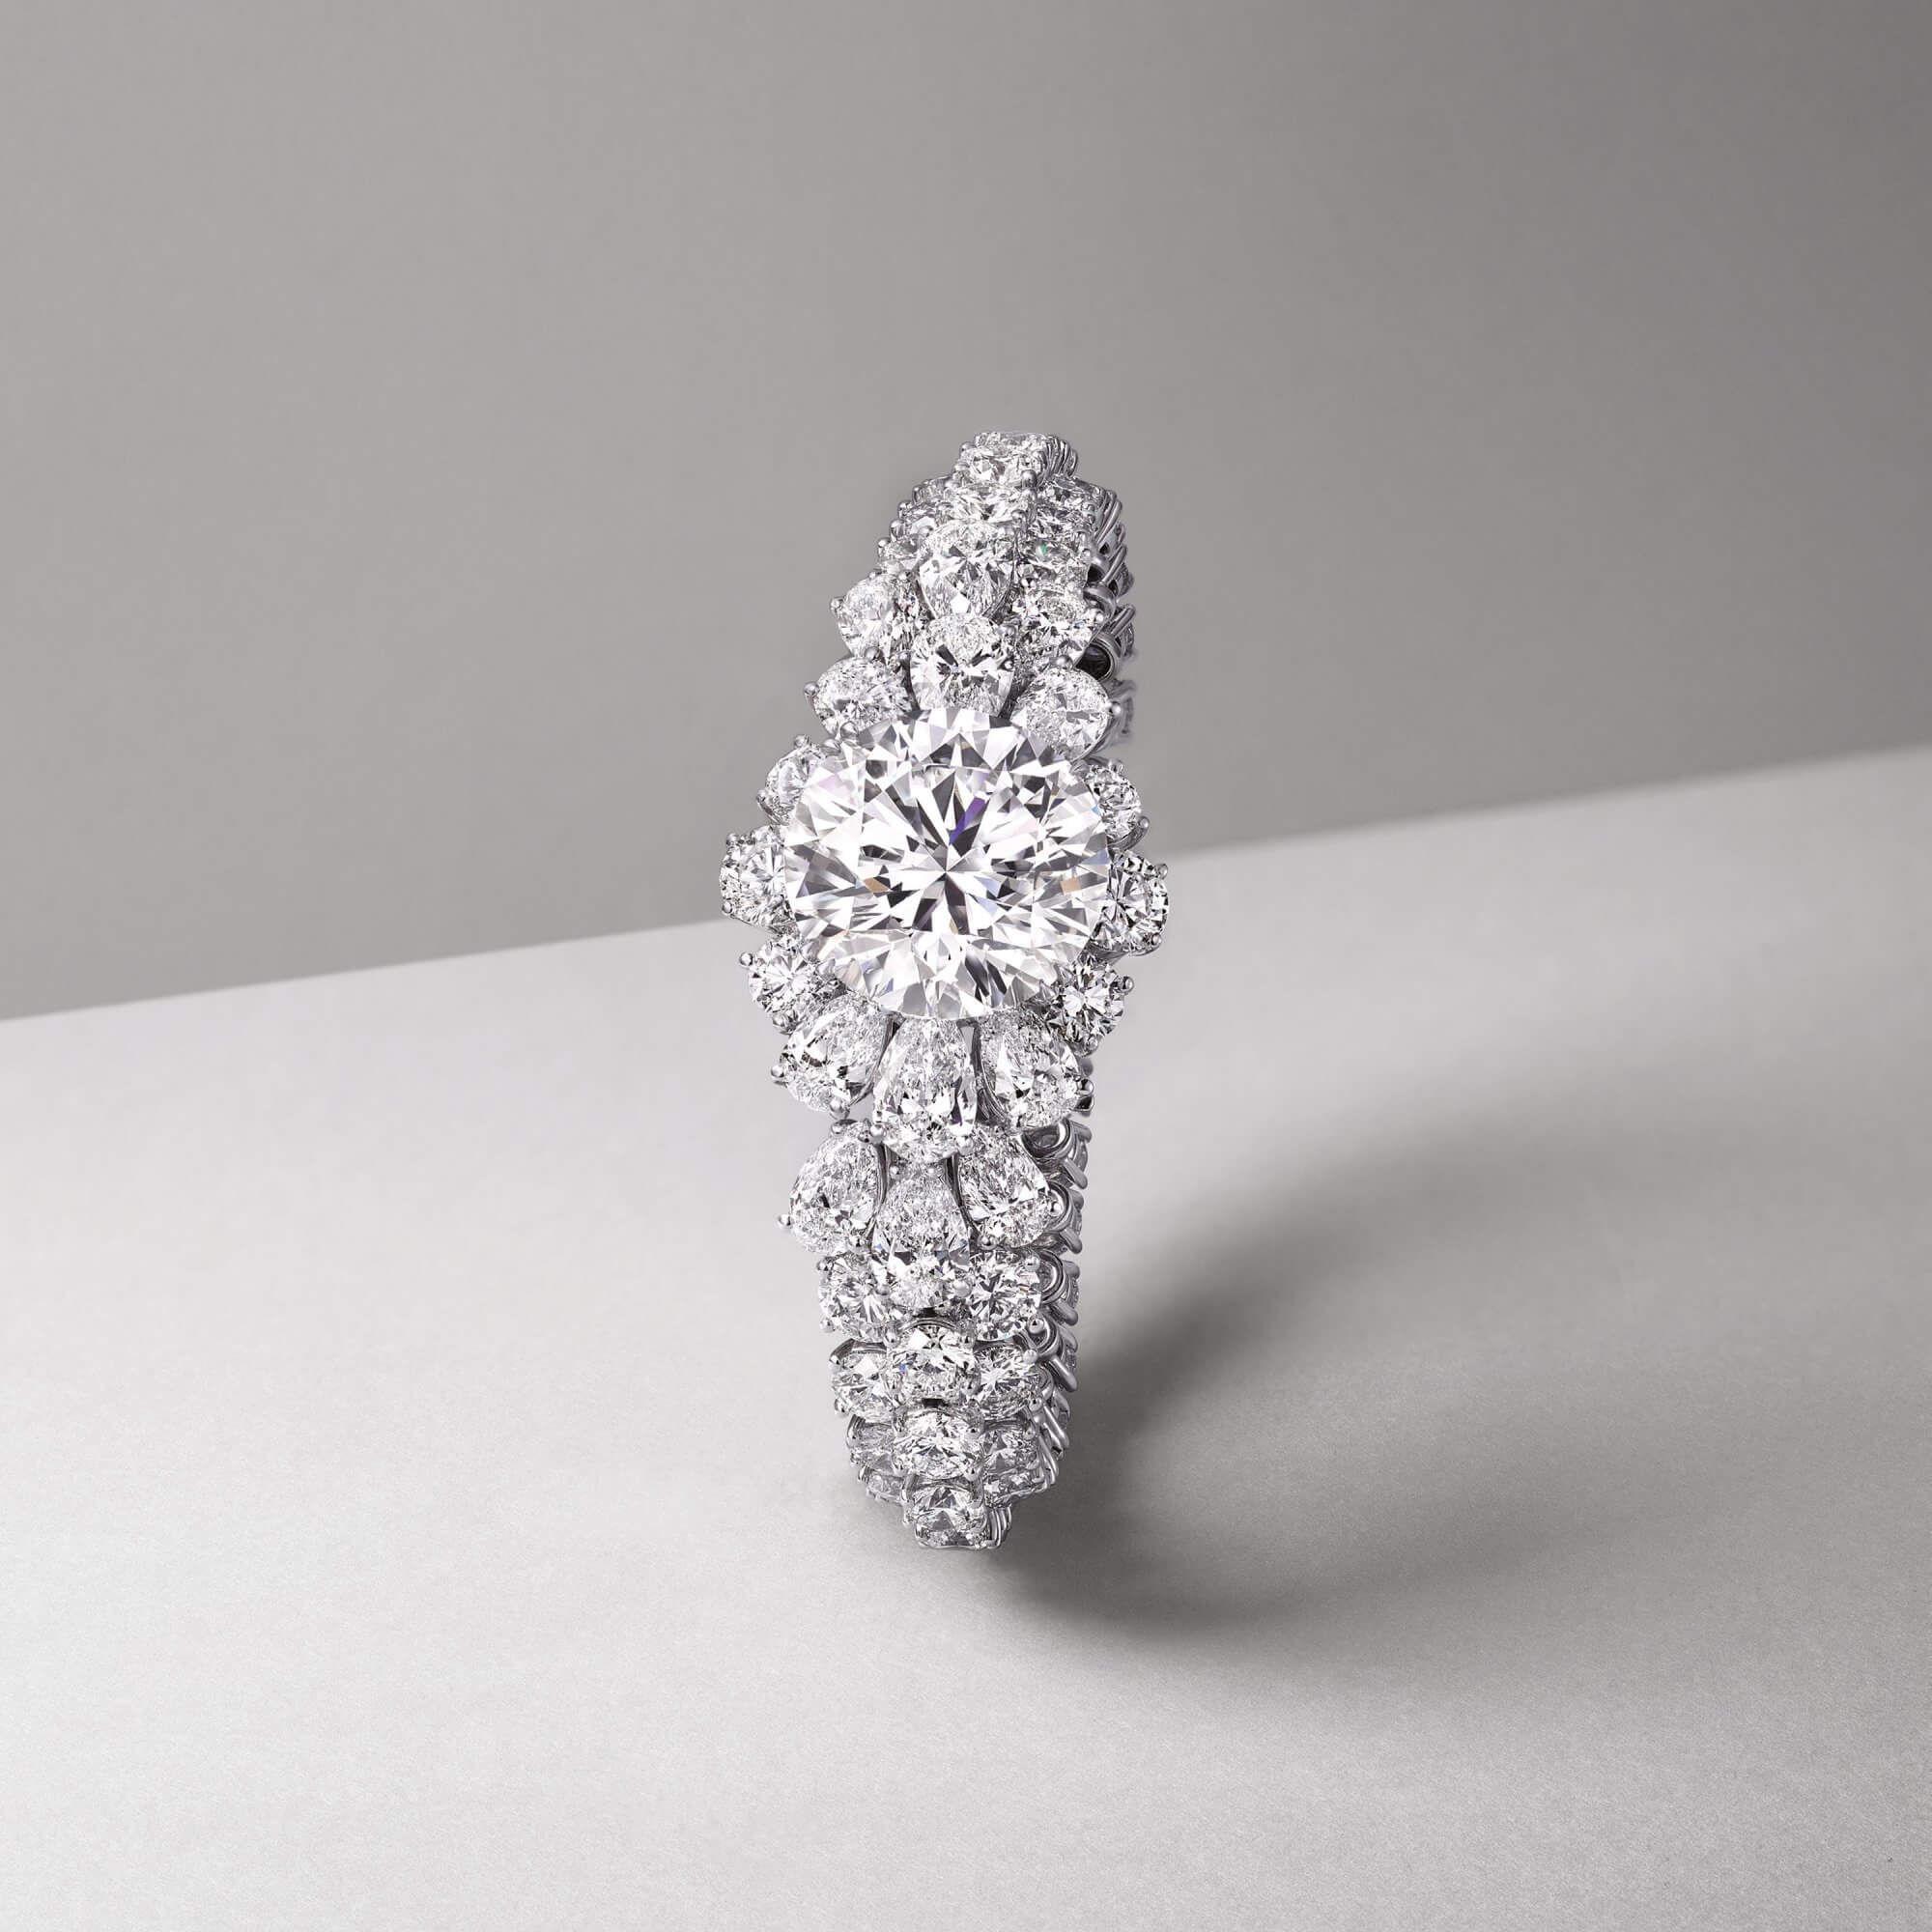 Graff diamond bracelet featuring a 30 carat D round diamond centre stone